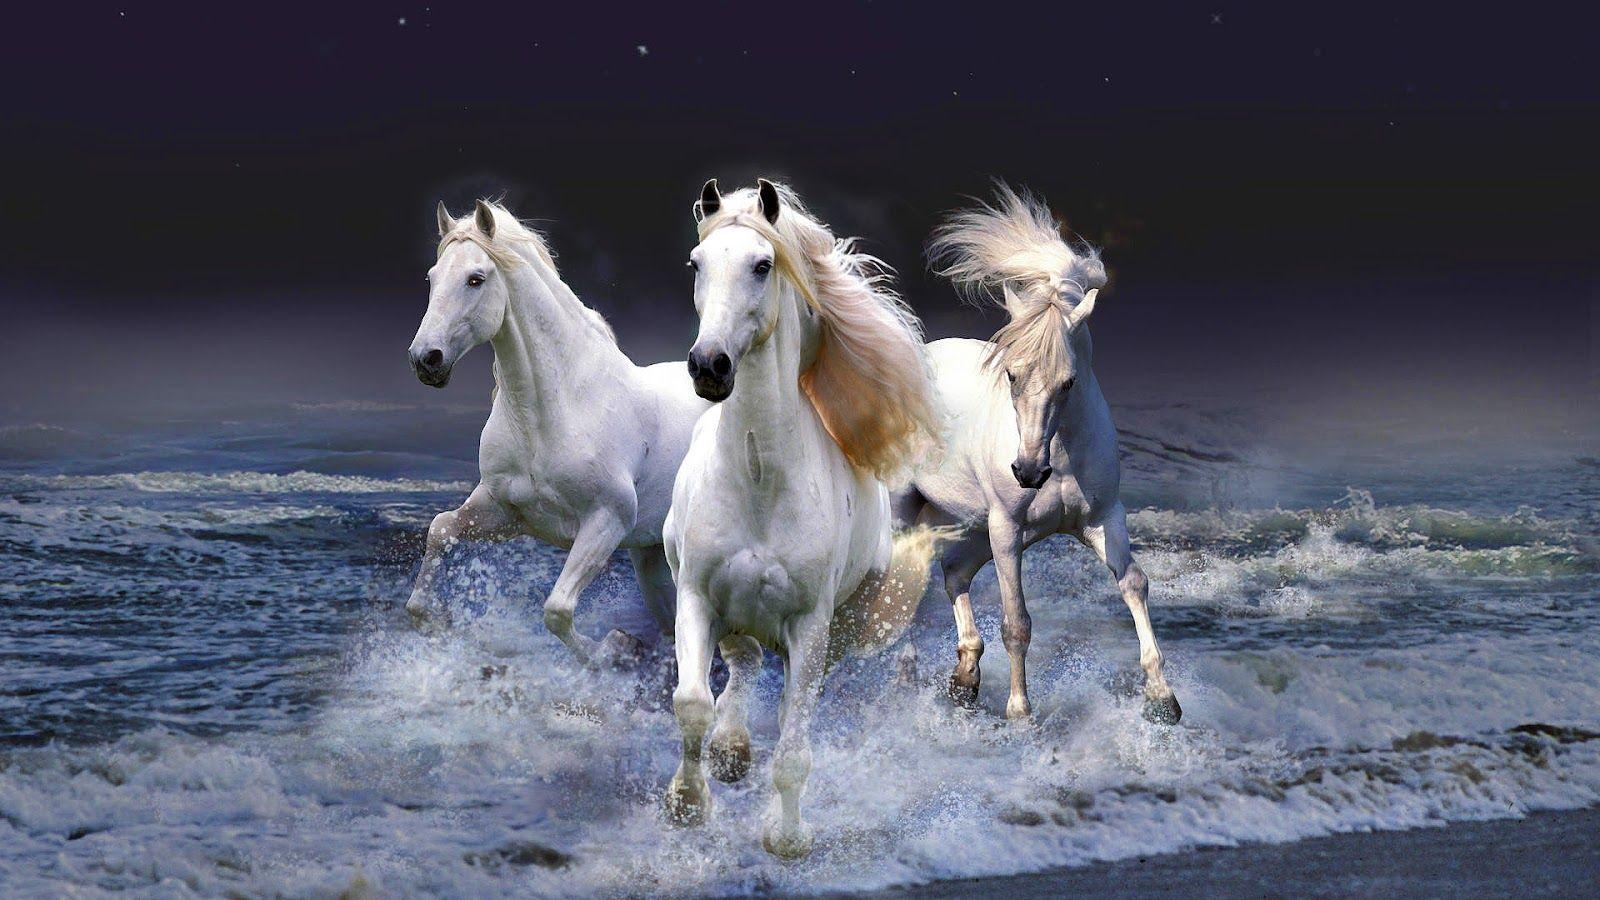 HD Animal Wallpaper Of White Horses Running Through Water Or Sea